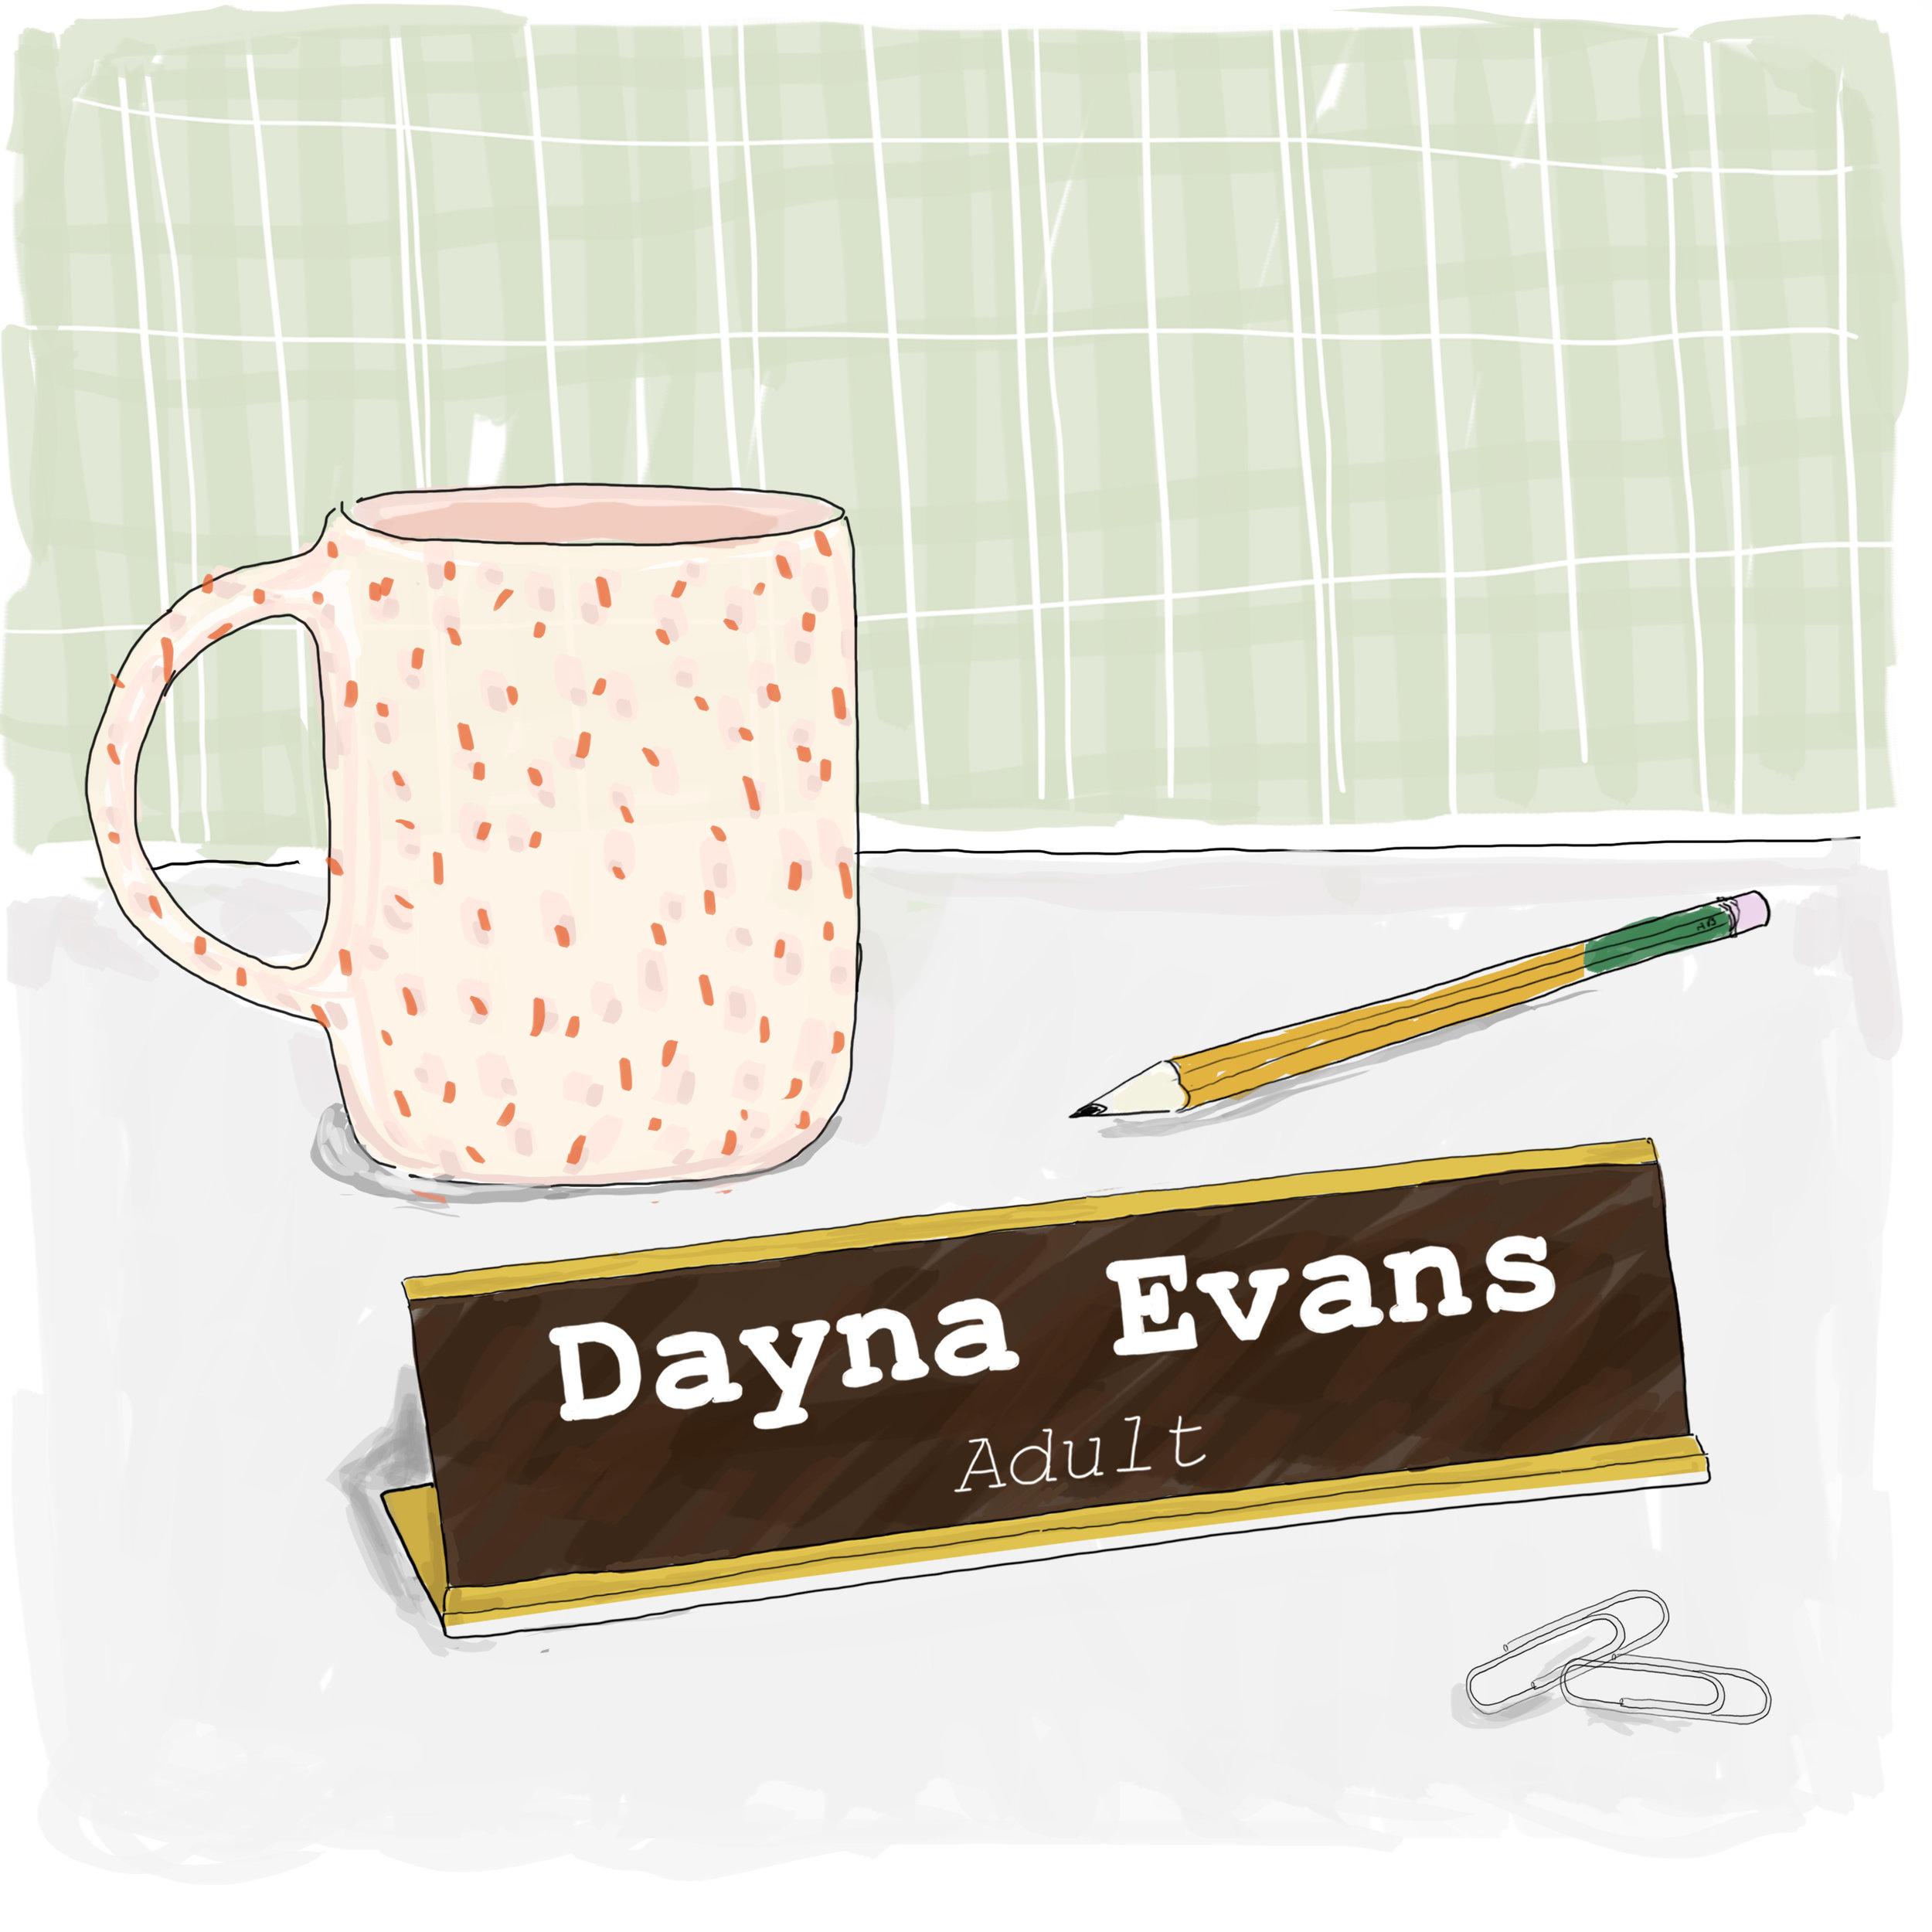 HAYSTACK_DAYNA_EVANS (1).jpg